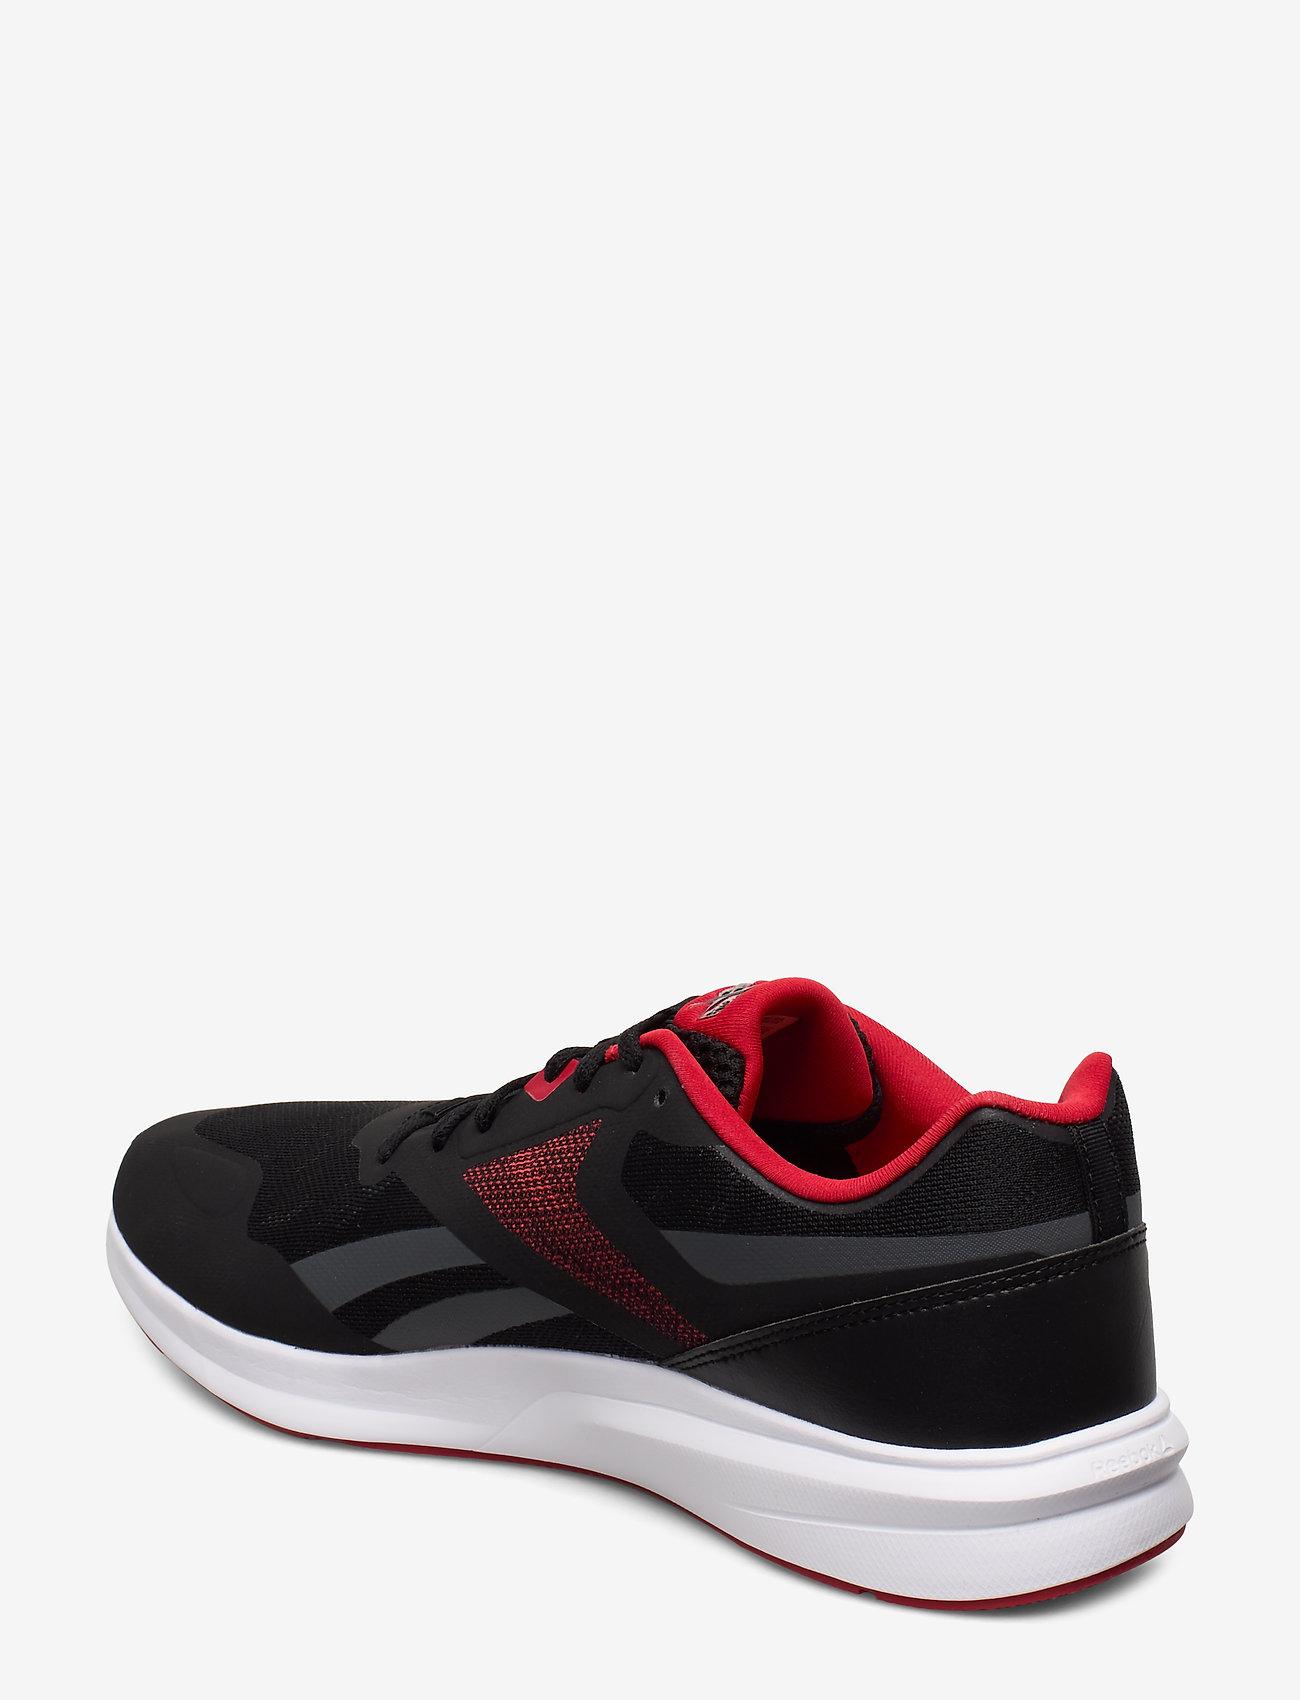 Reebok Runner 4.0 Shoes (Black/trugr7/excred) - Reebok Performance